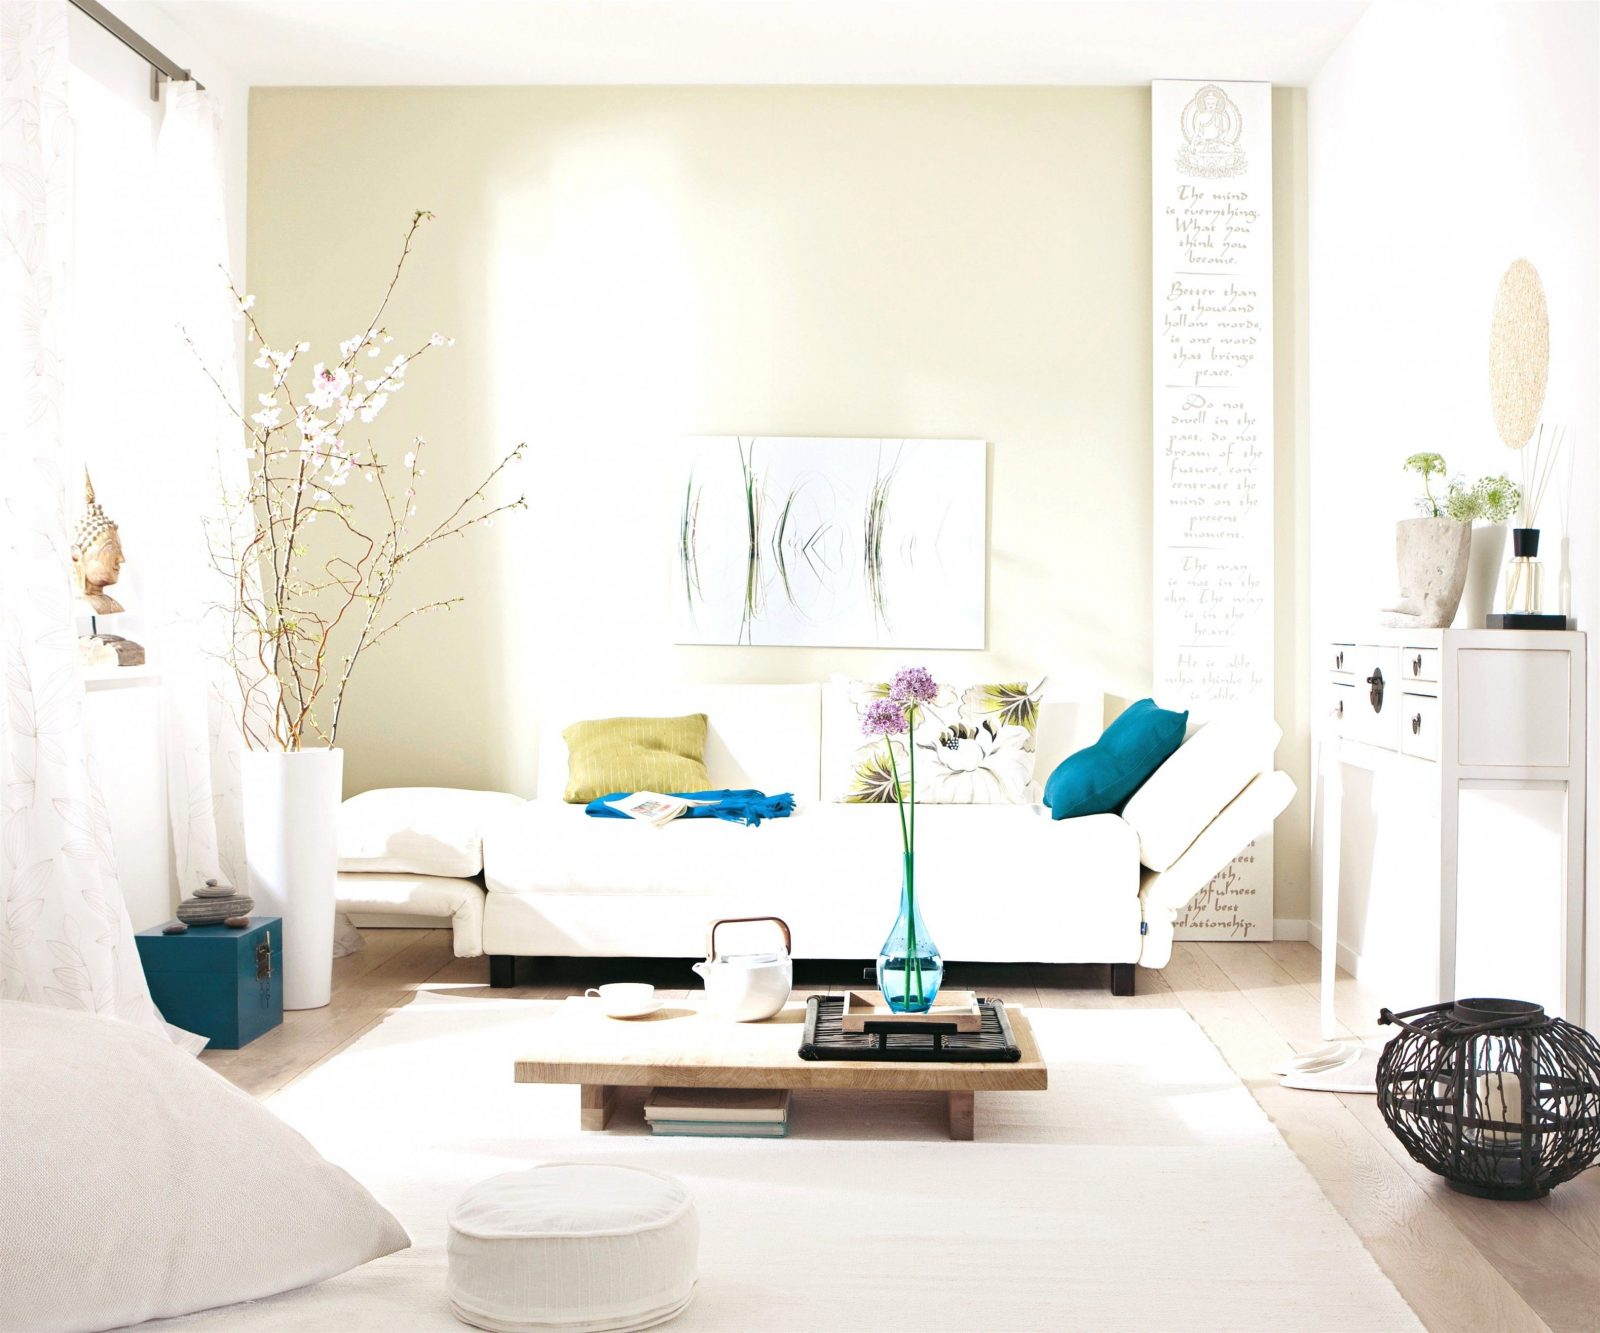 Zimmer Dekoration Deko Ideen Kunstlicheimmerpflanzen Selber Machen von Deko Ideen Selbermachen Jugendzimmer Bild